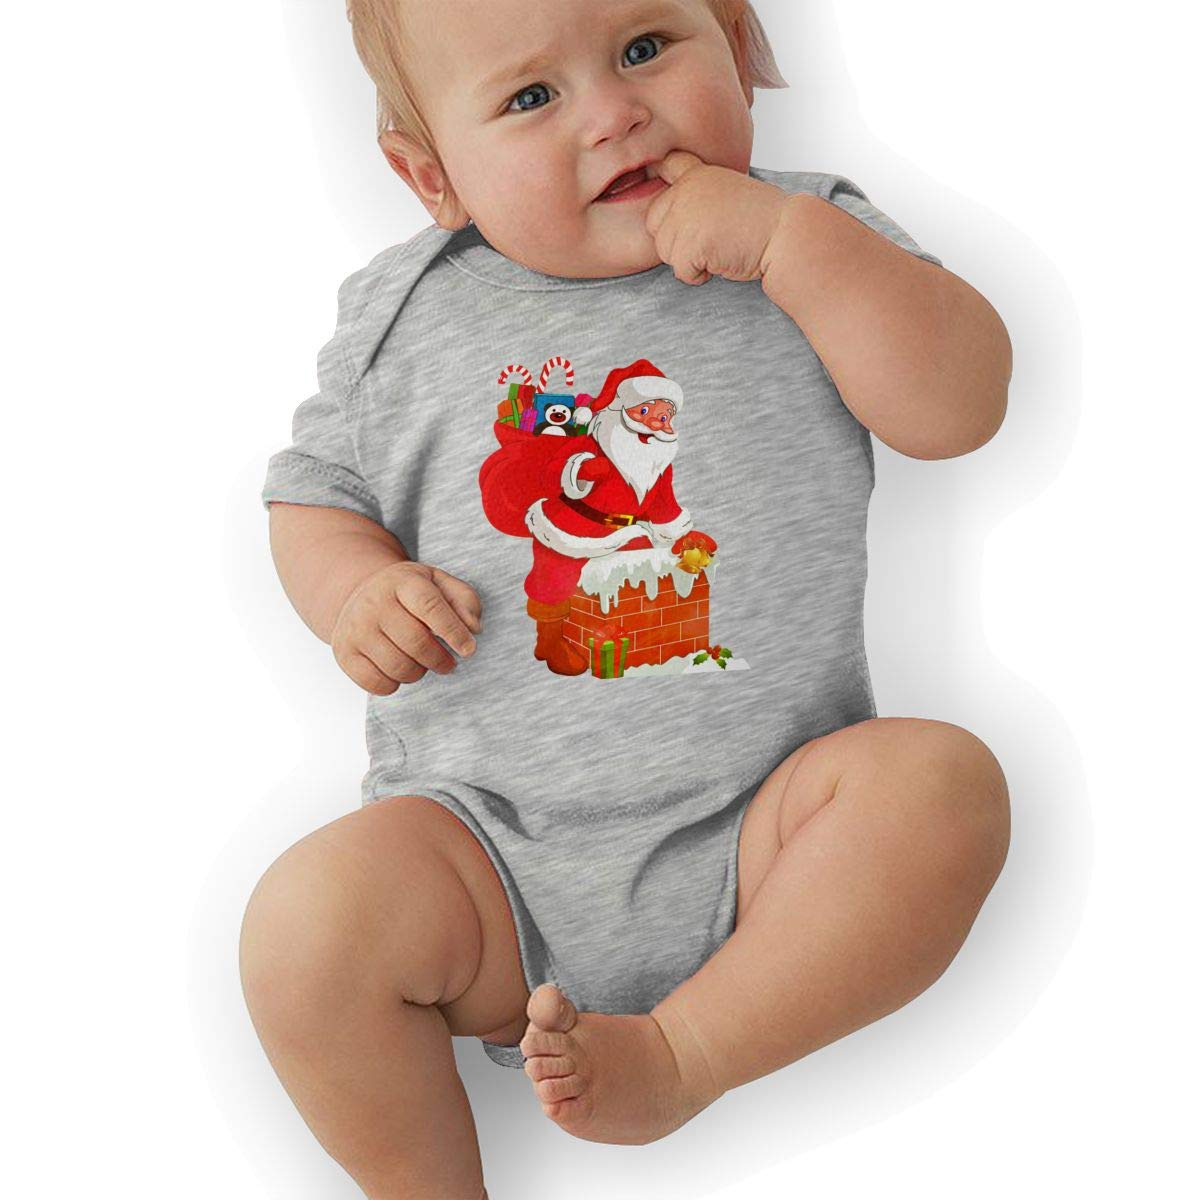 Newborn Baby Girls Bodysuit Short-Sleeve Onesie Santa Claus Climb Into The Chimney Print Rompers Summer Pajamas